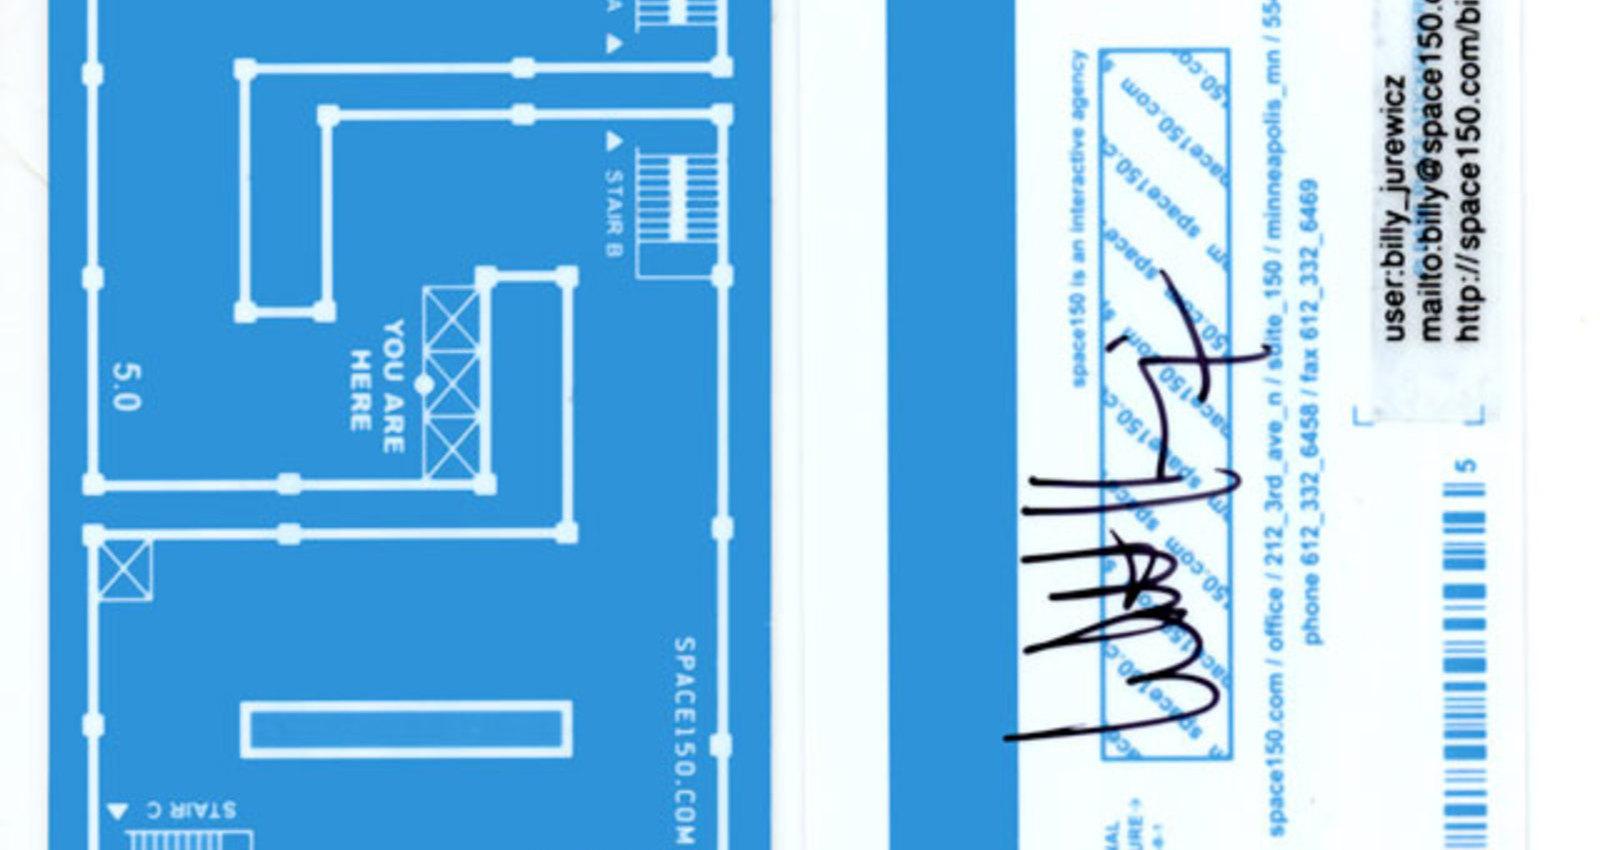 business cards: v 5.0, v 6.0, v 7.0 complete identity